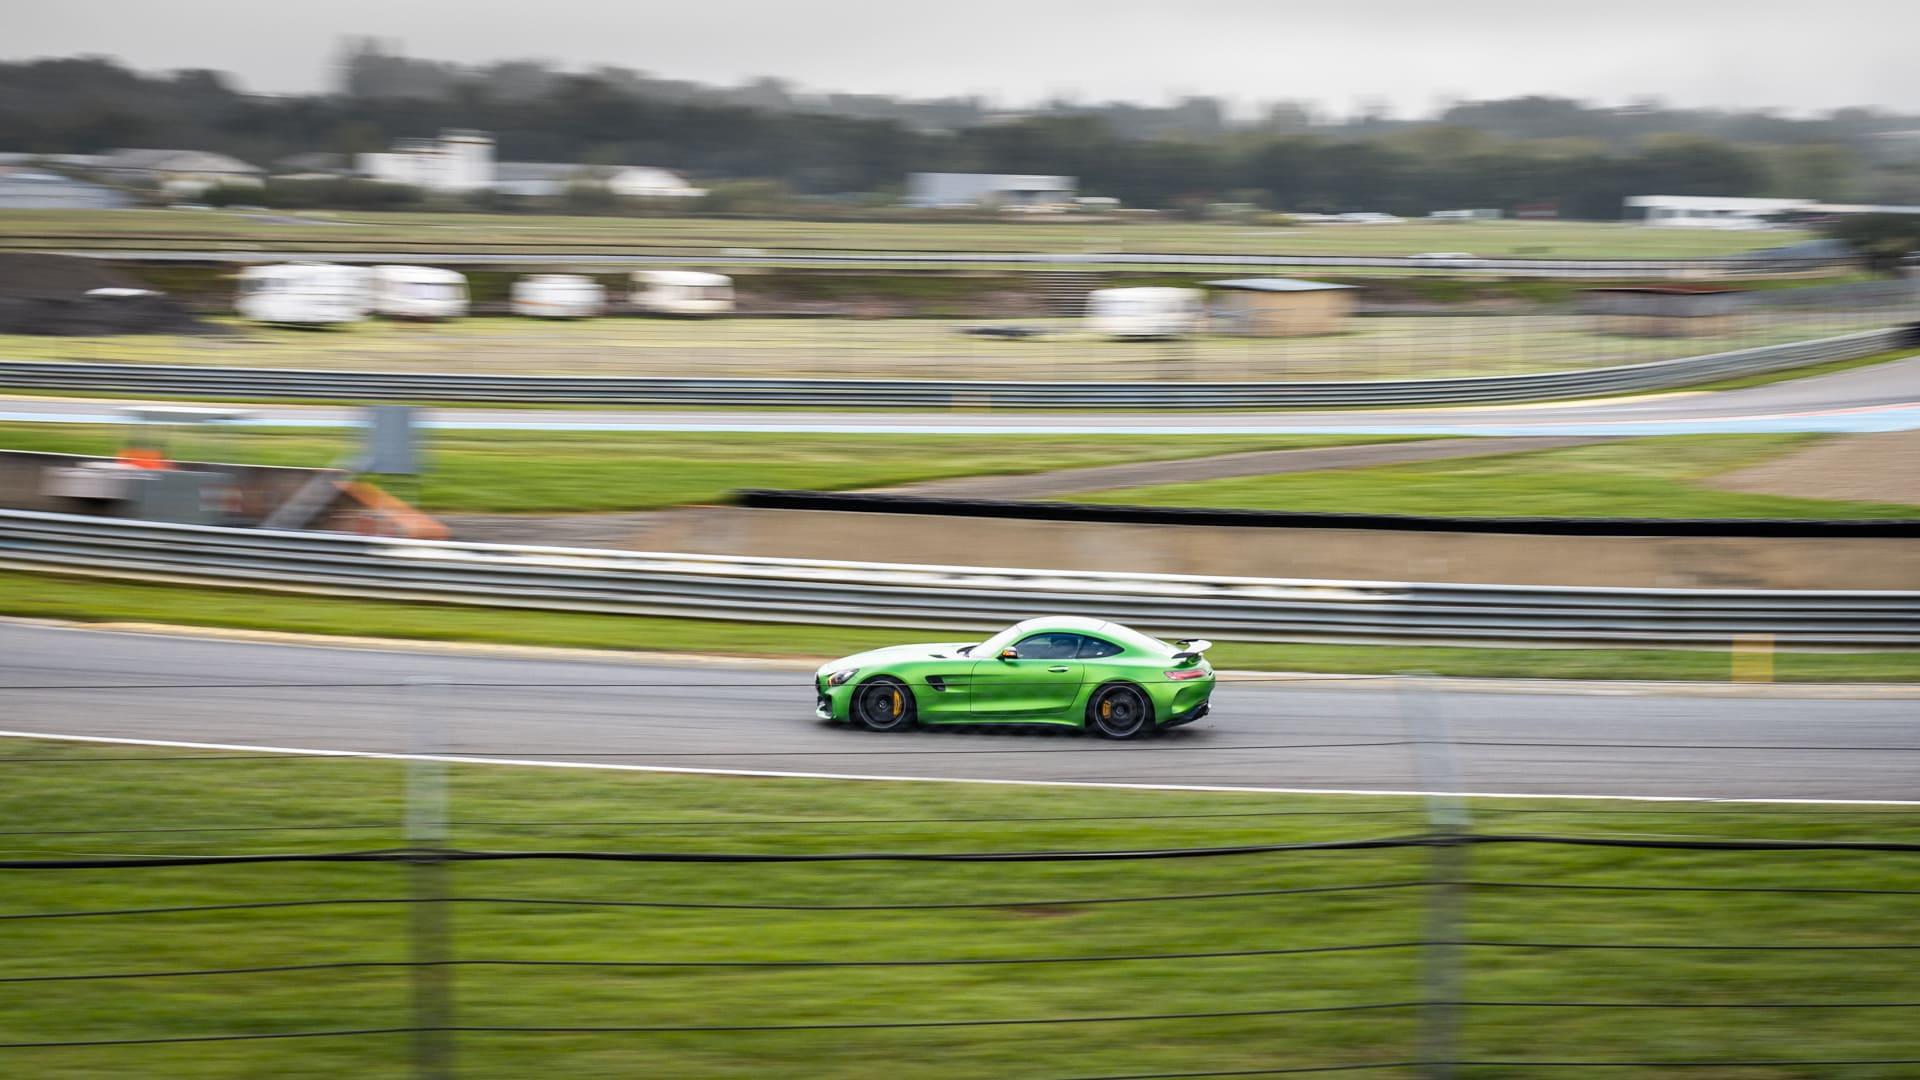 Green AMG GTR